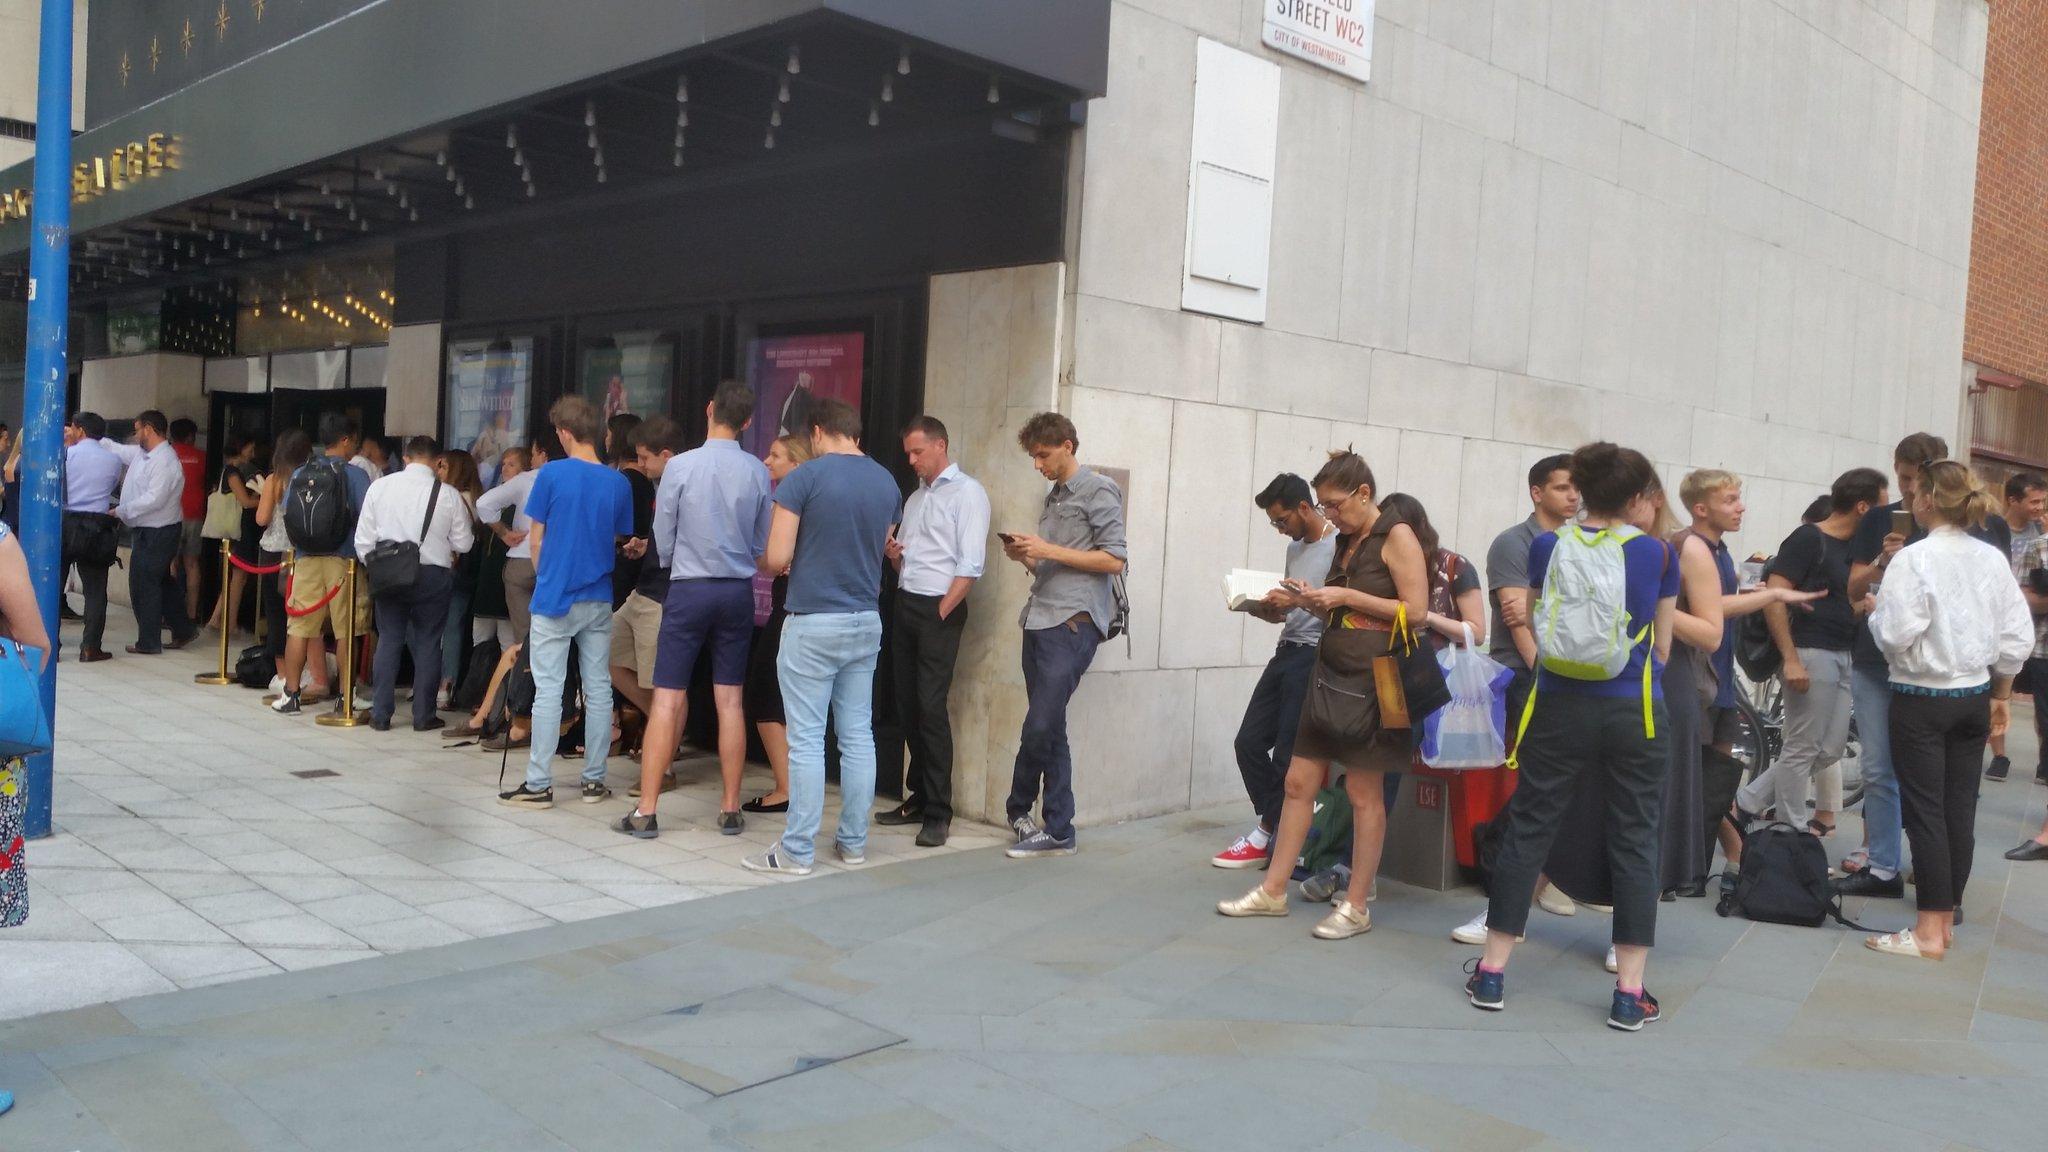 A long queue waiting in front of the Peacock theatre for the Major of London Sadiq Khan @SadiqKhan #LSESadiq https://t.co/Fe3KkJJGRv